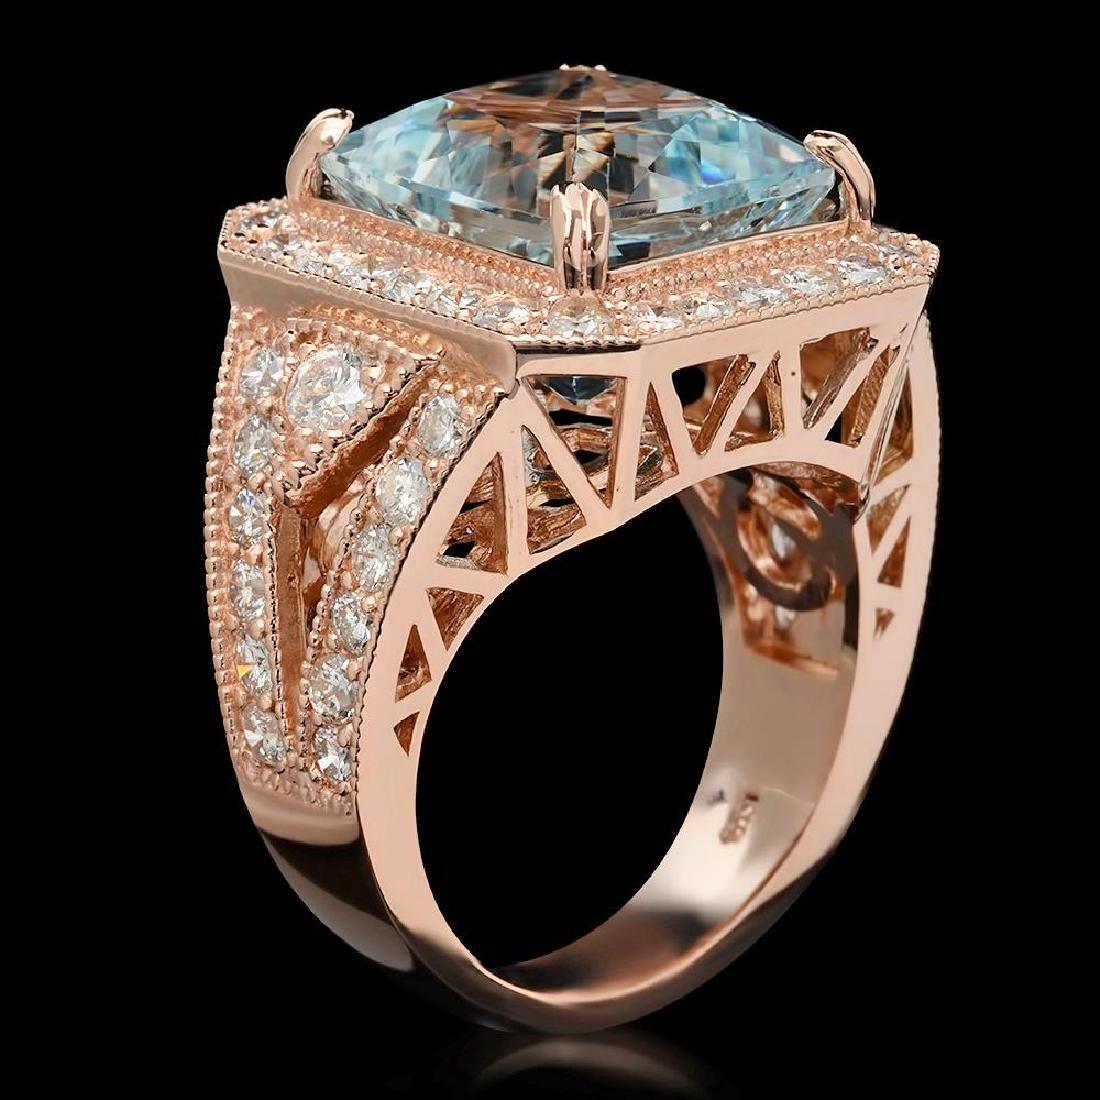 14K Gold 9.48ct Aquamarine & 2.10ct Diamond Ring - 2